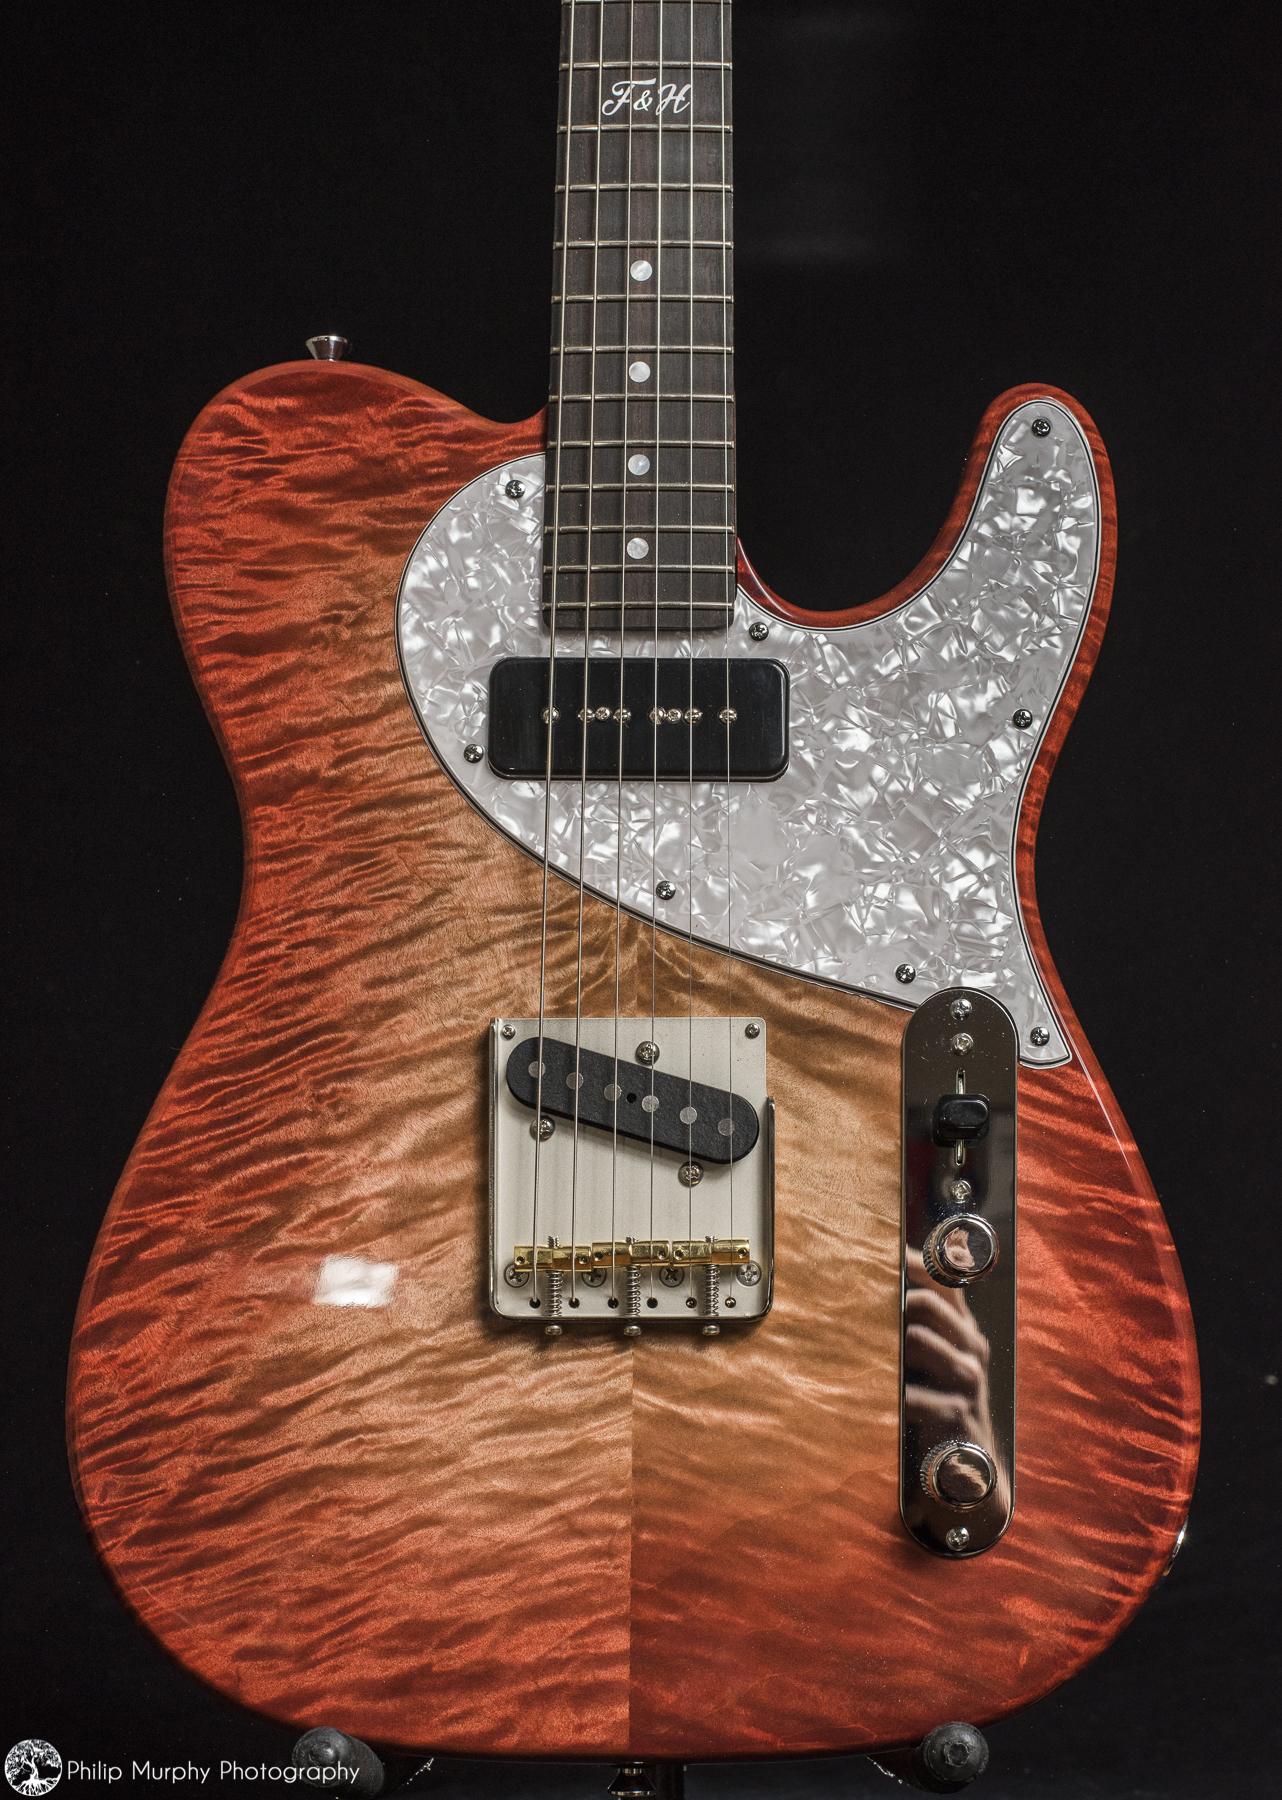 PhilipMurphy-Memphis-GuitarSpa-5